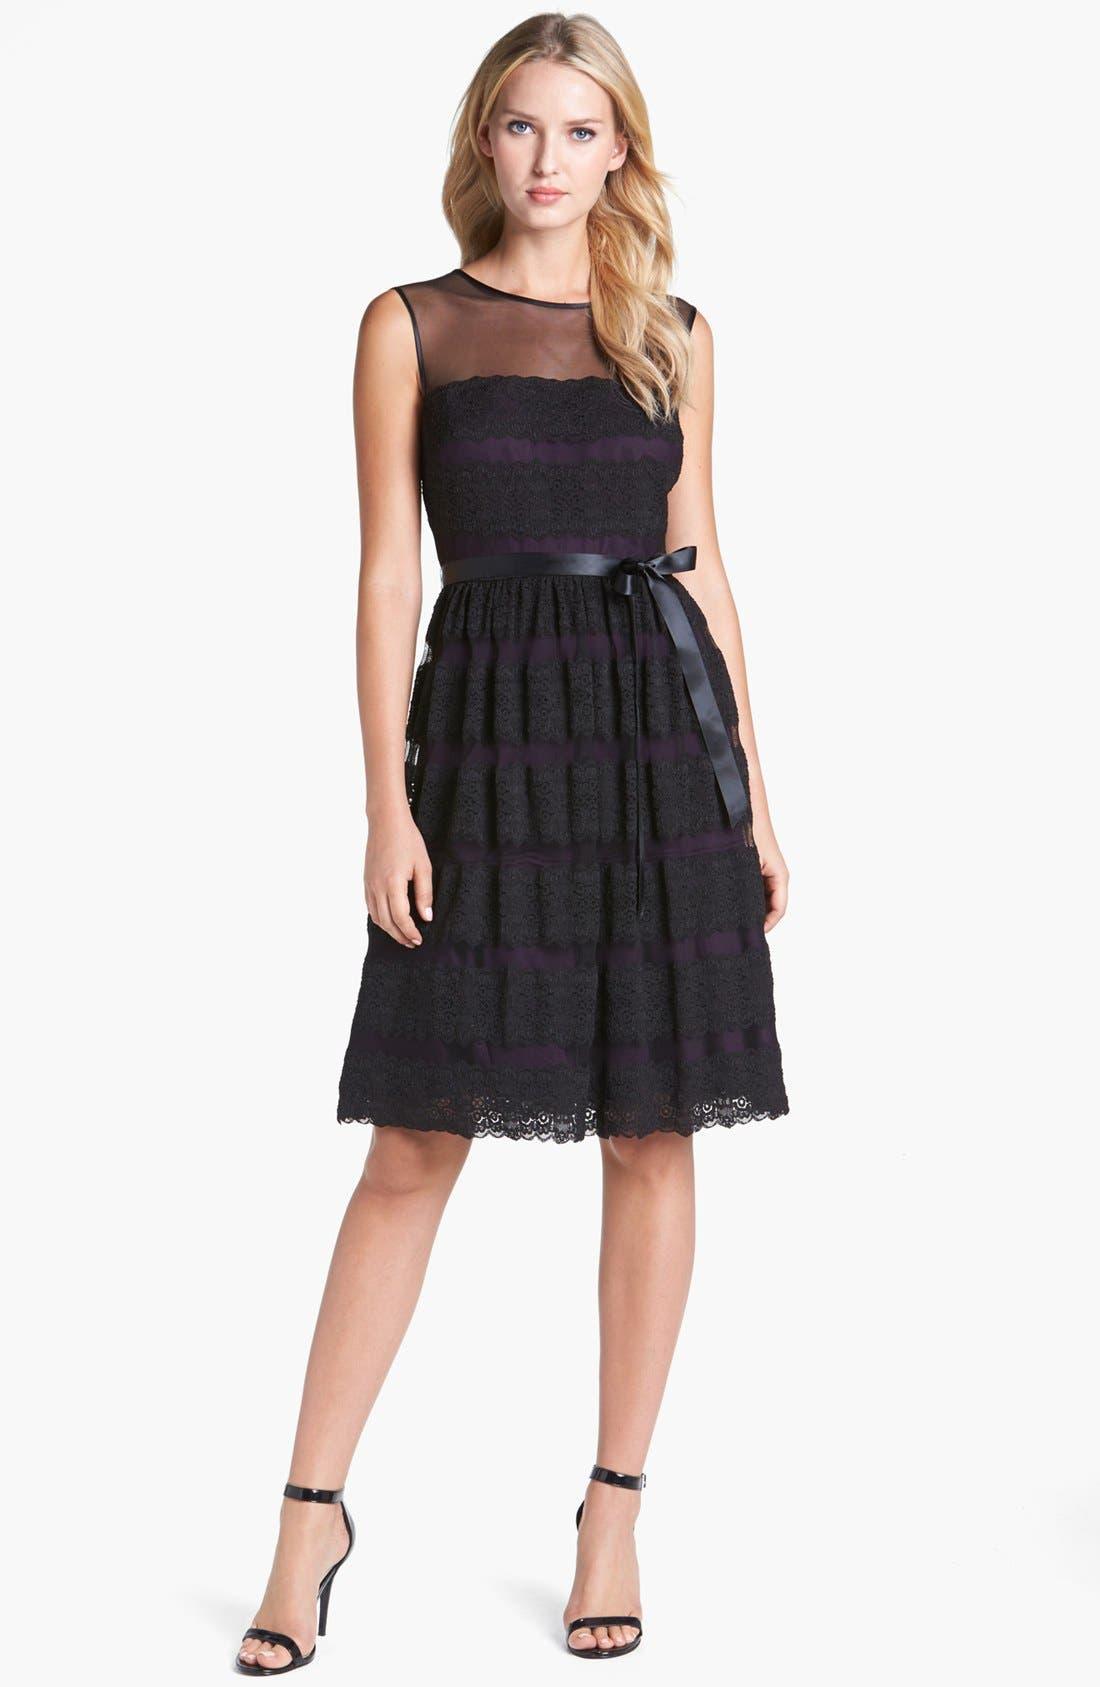 Alternate Image 1 Selected - Alex Evenings Lace Fit & Flare Dress (Petite)